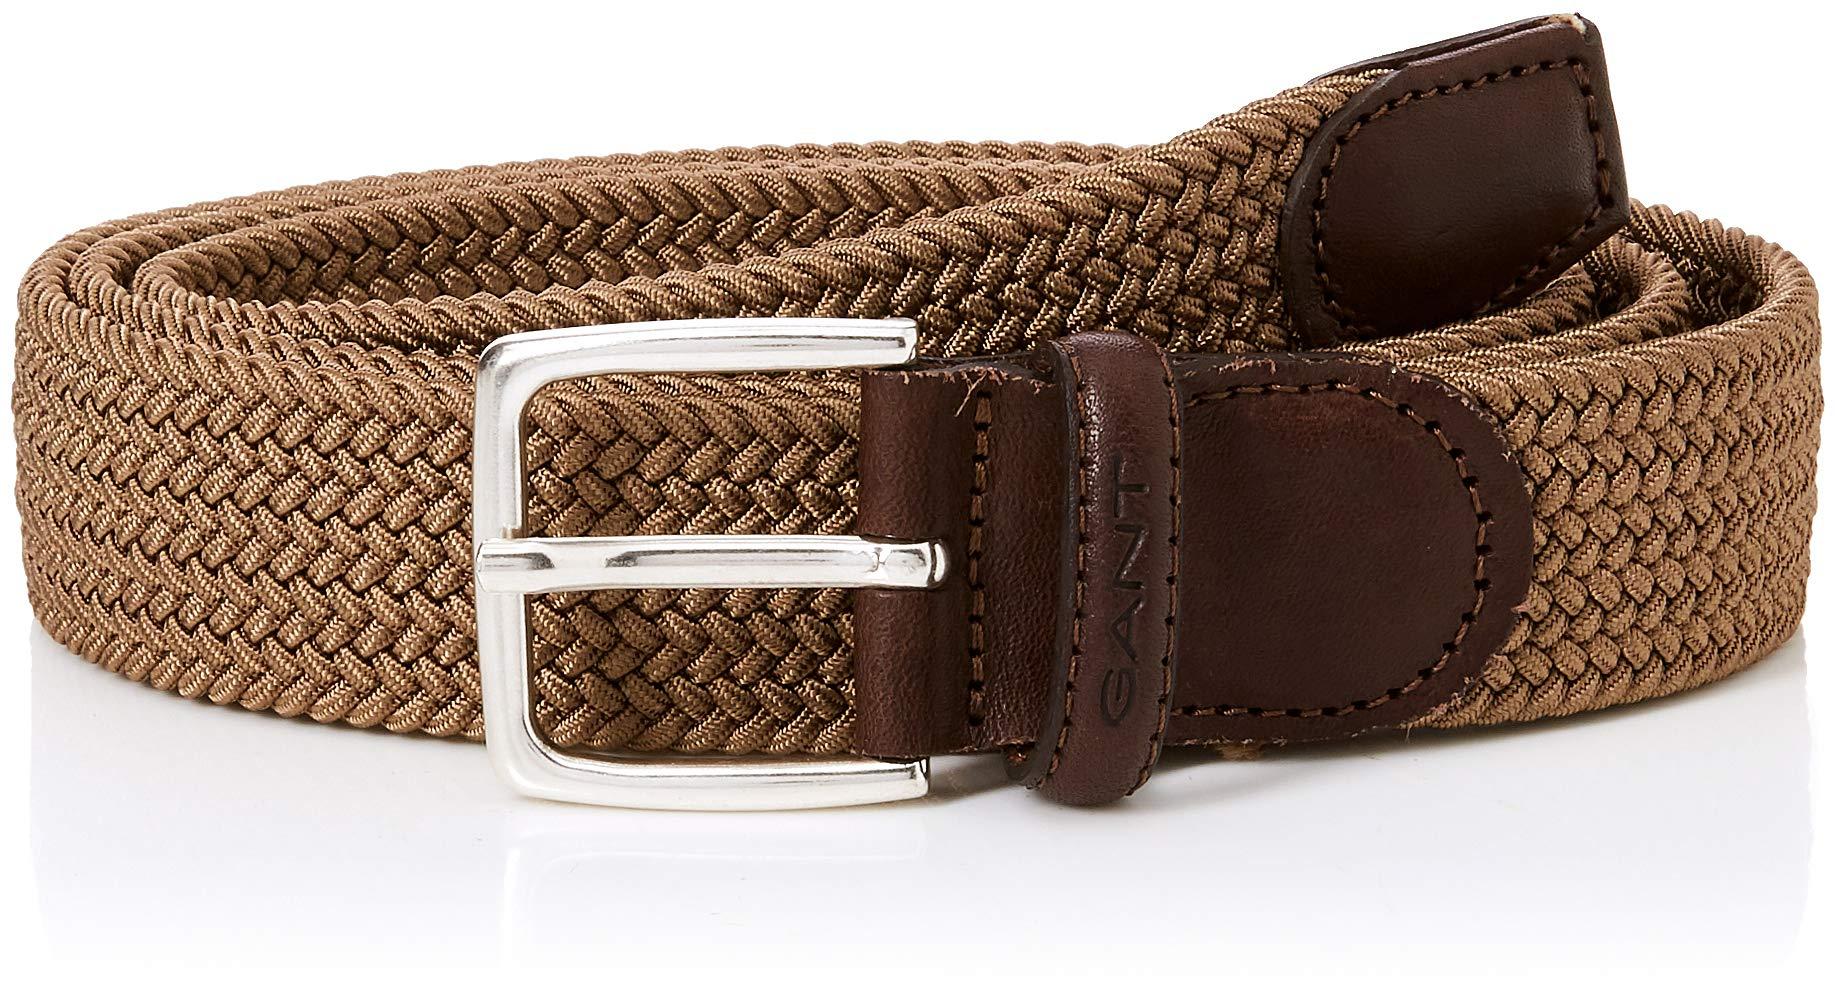 261120 Belt Homme Gant Elastic CeintureMarrondesert Brown Braid nw0PkO